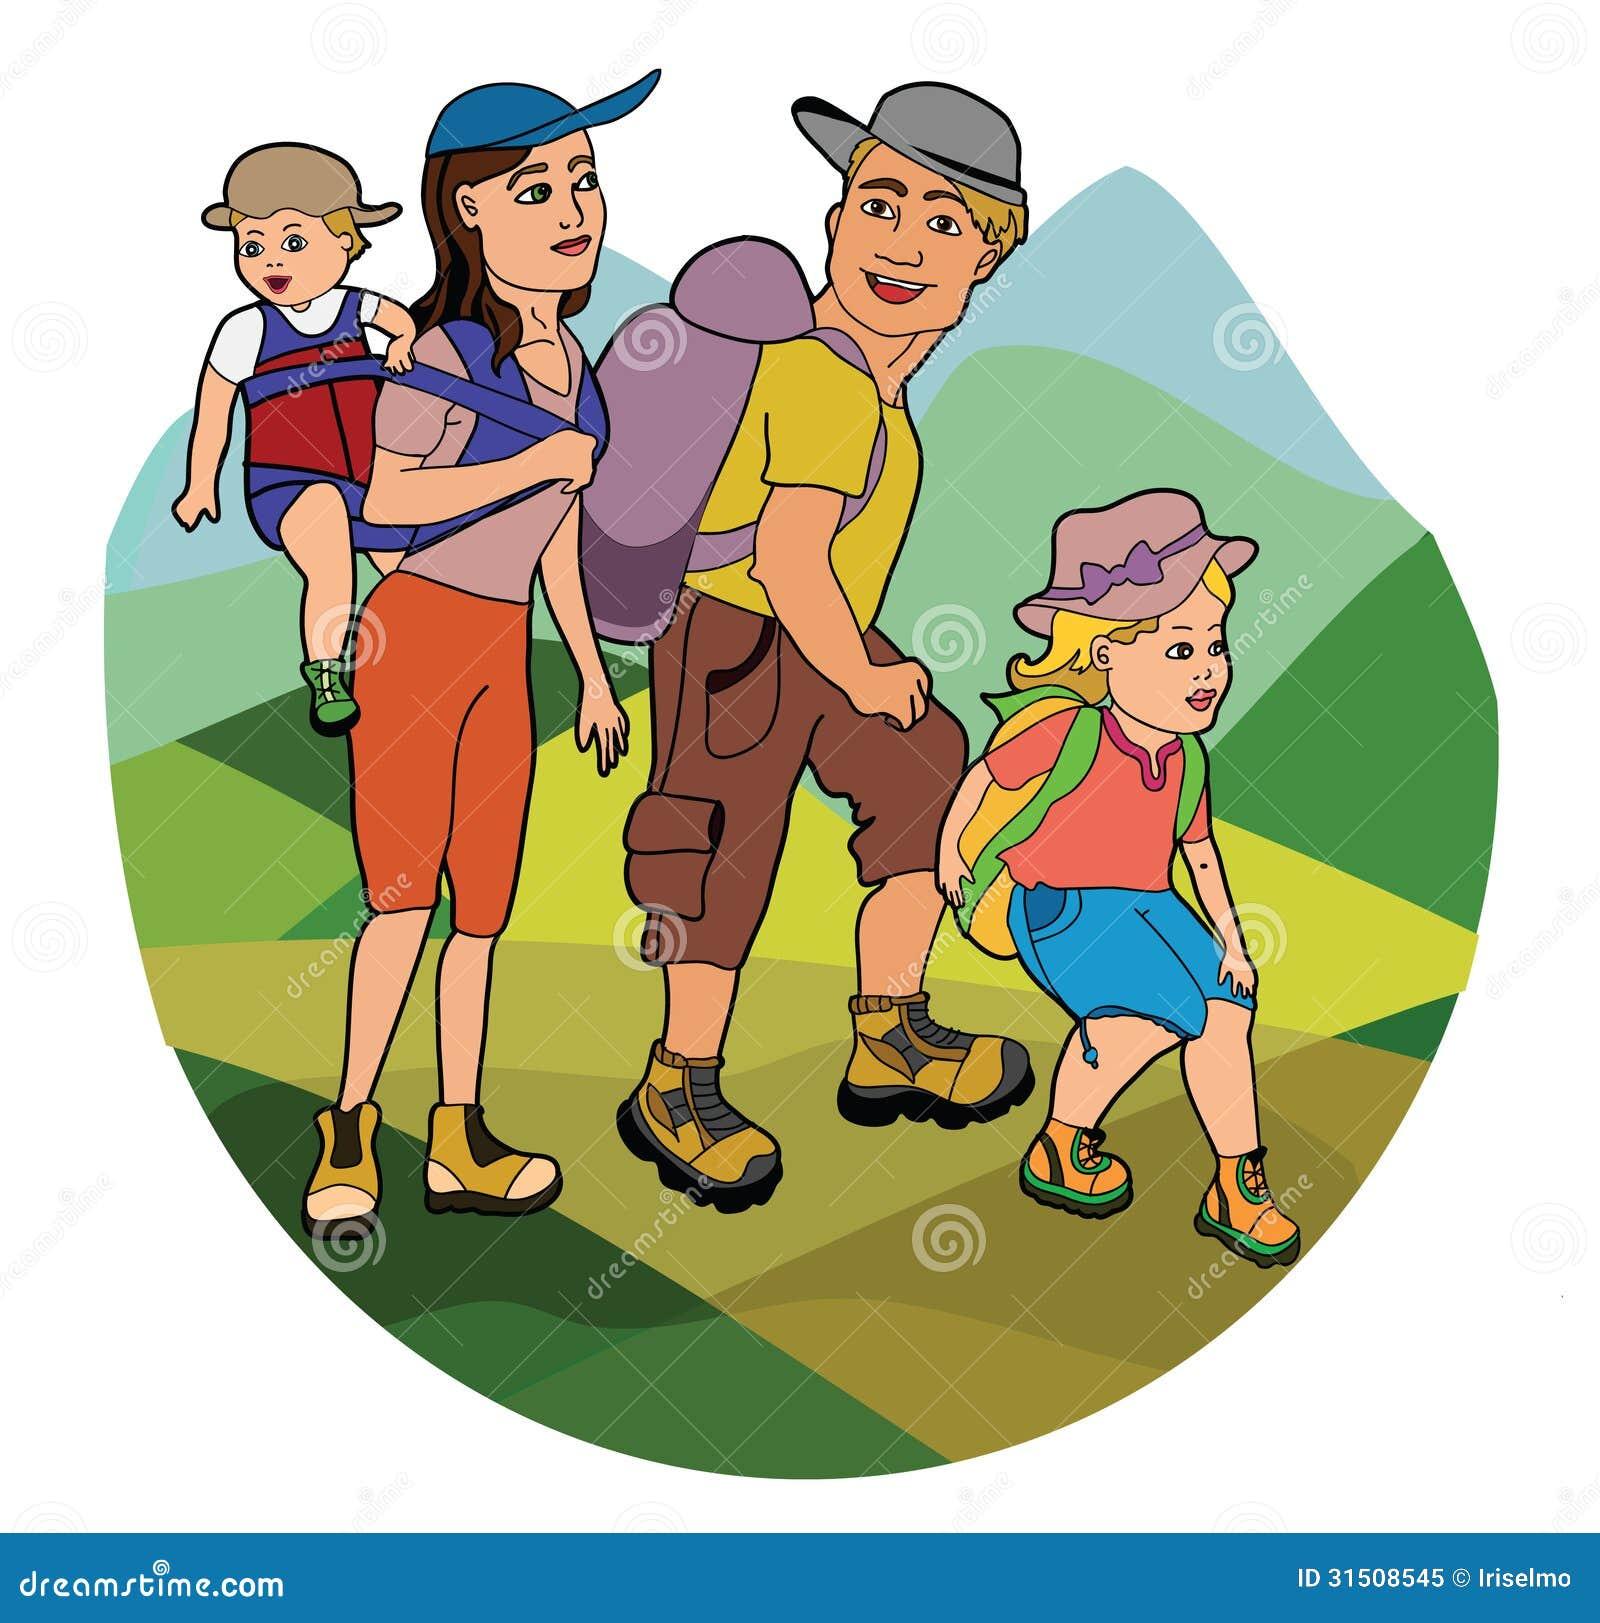 family hiking clipart - photo #26